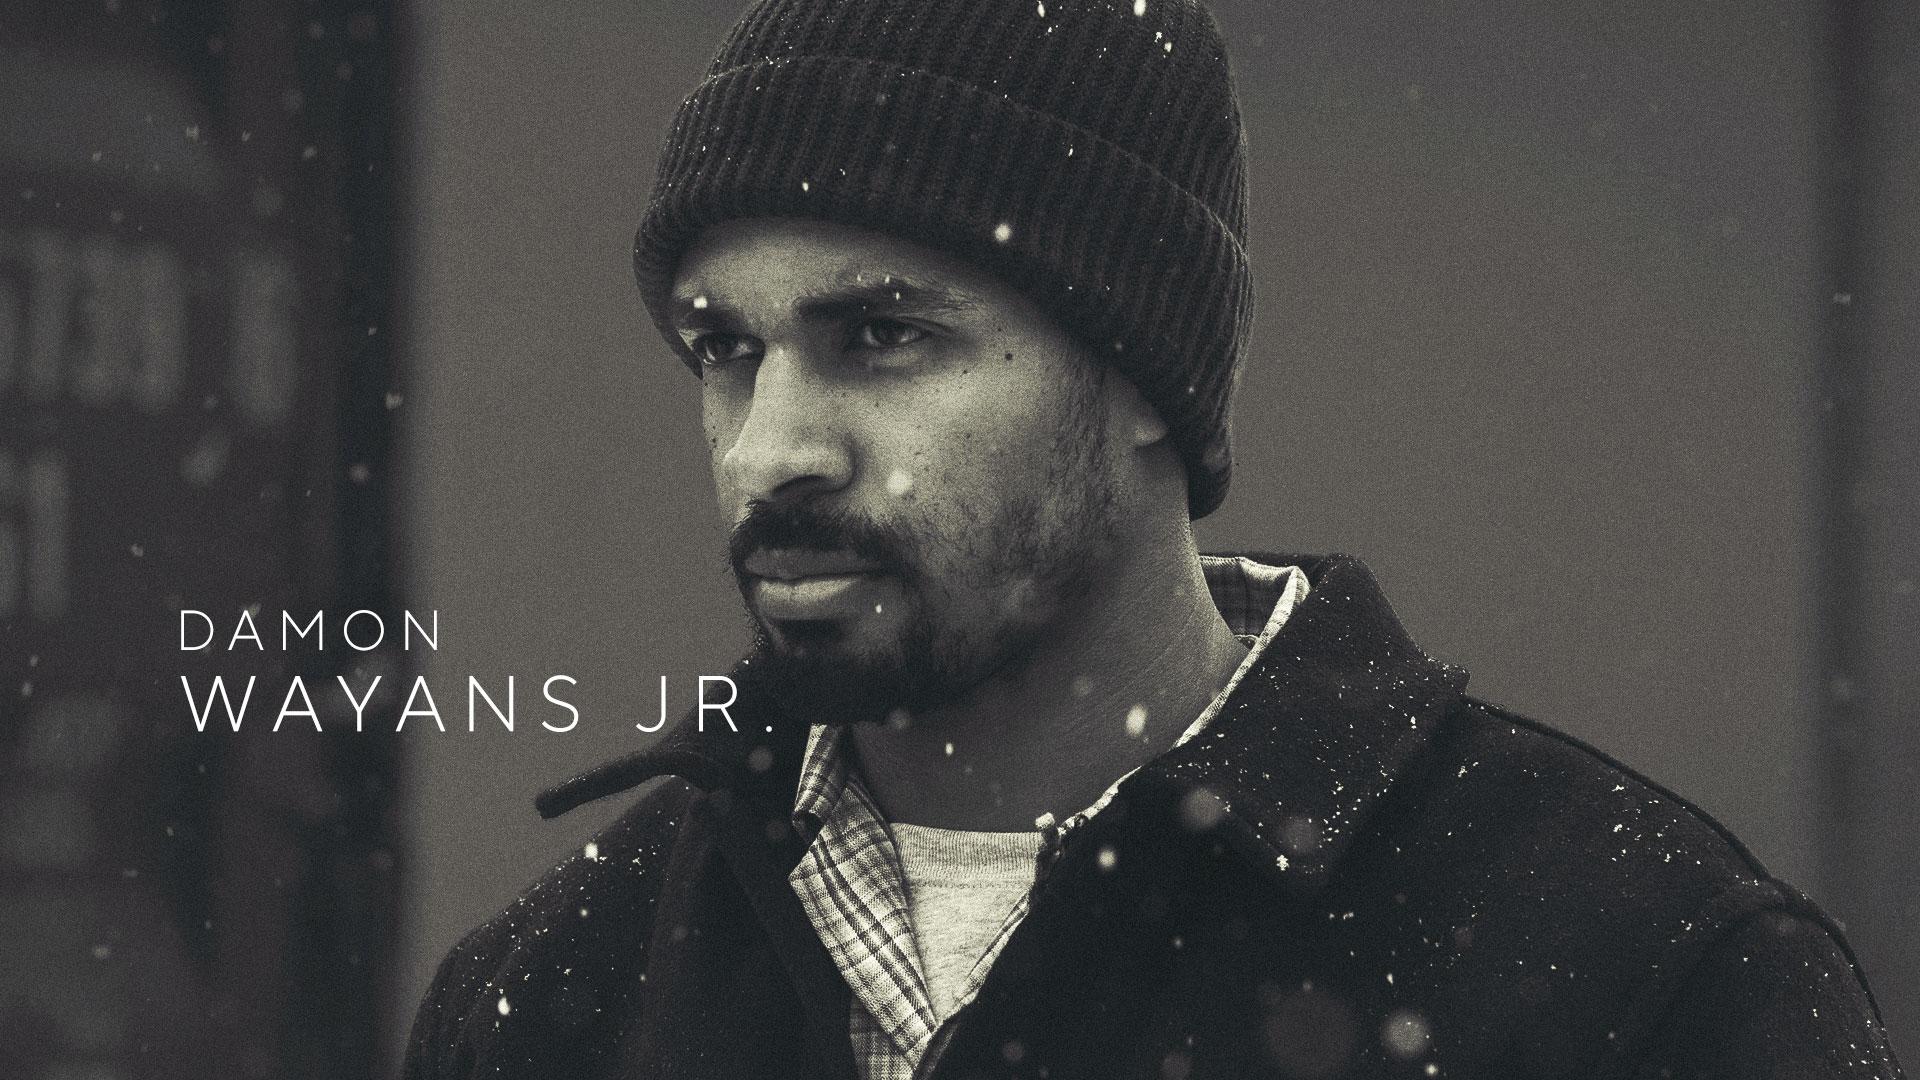 Damon Wayans Jr. as Jason in